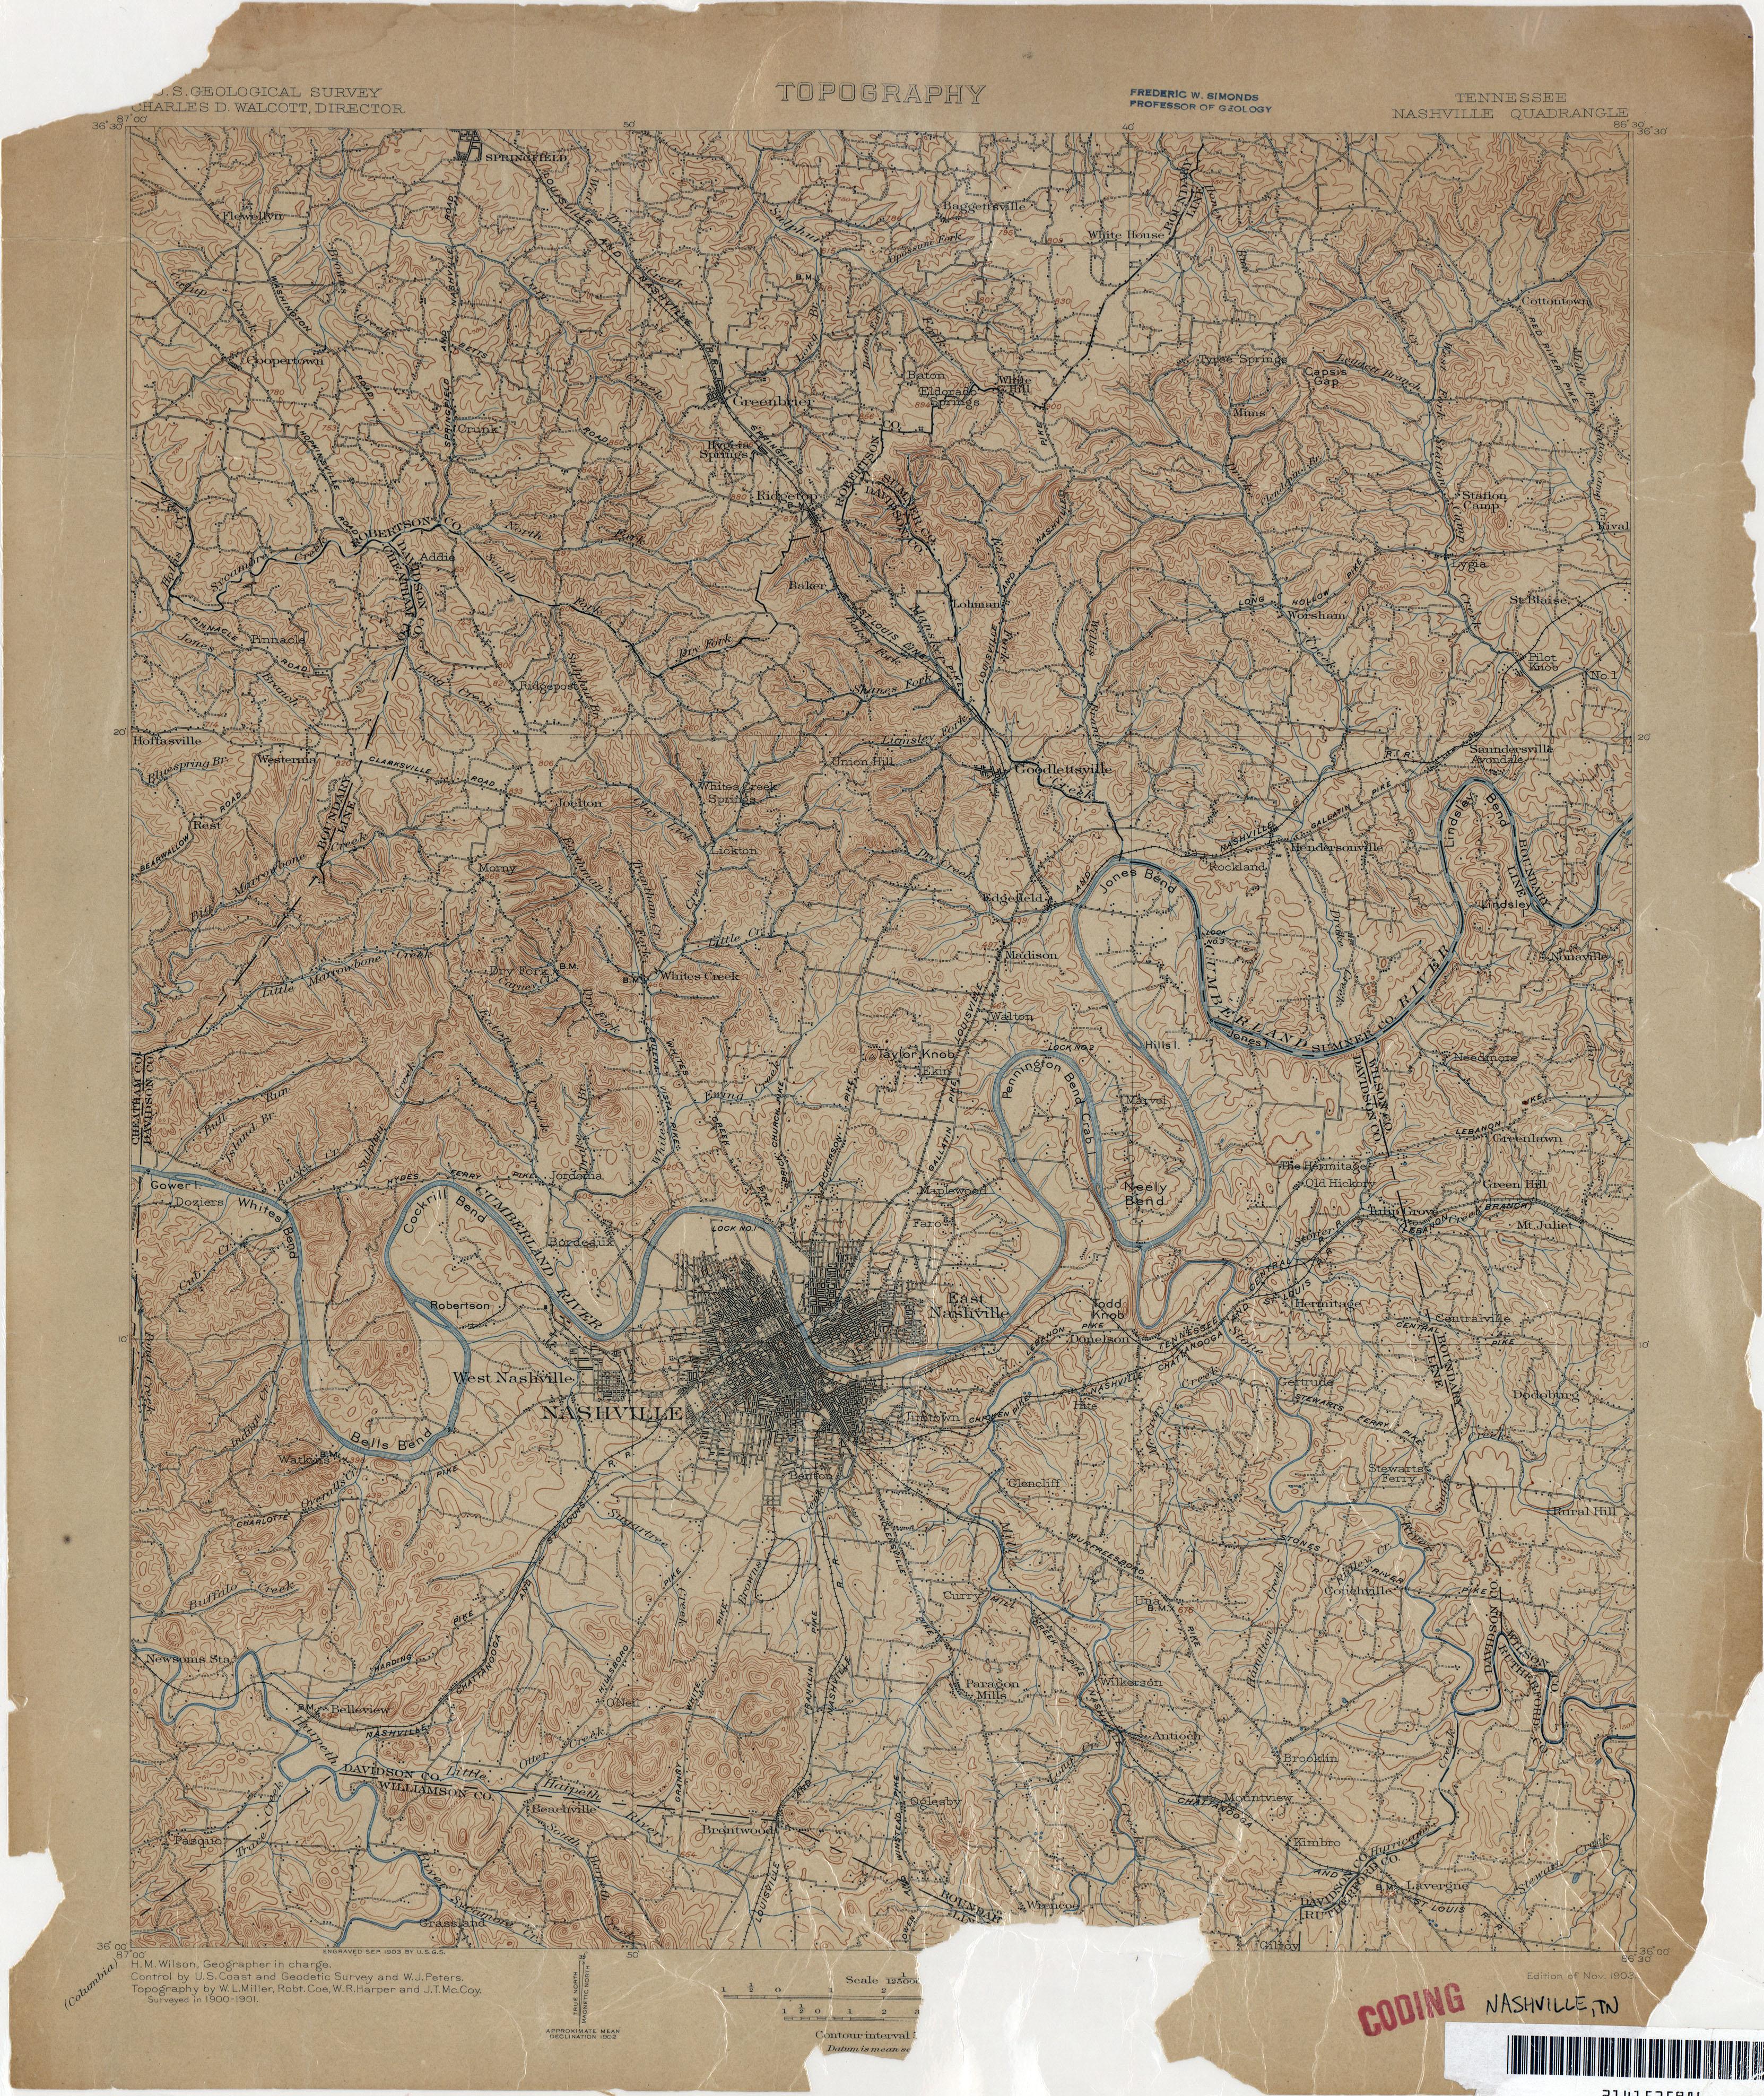 https://legacy.lib.utexas.edu/maps/topo/tennessee/txu-pclmaps-topo-tn-nashville-1901.jpg